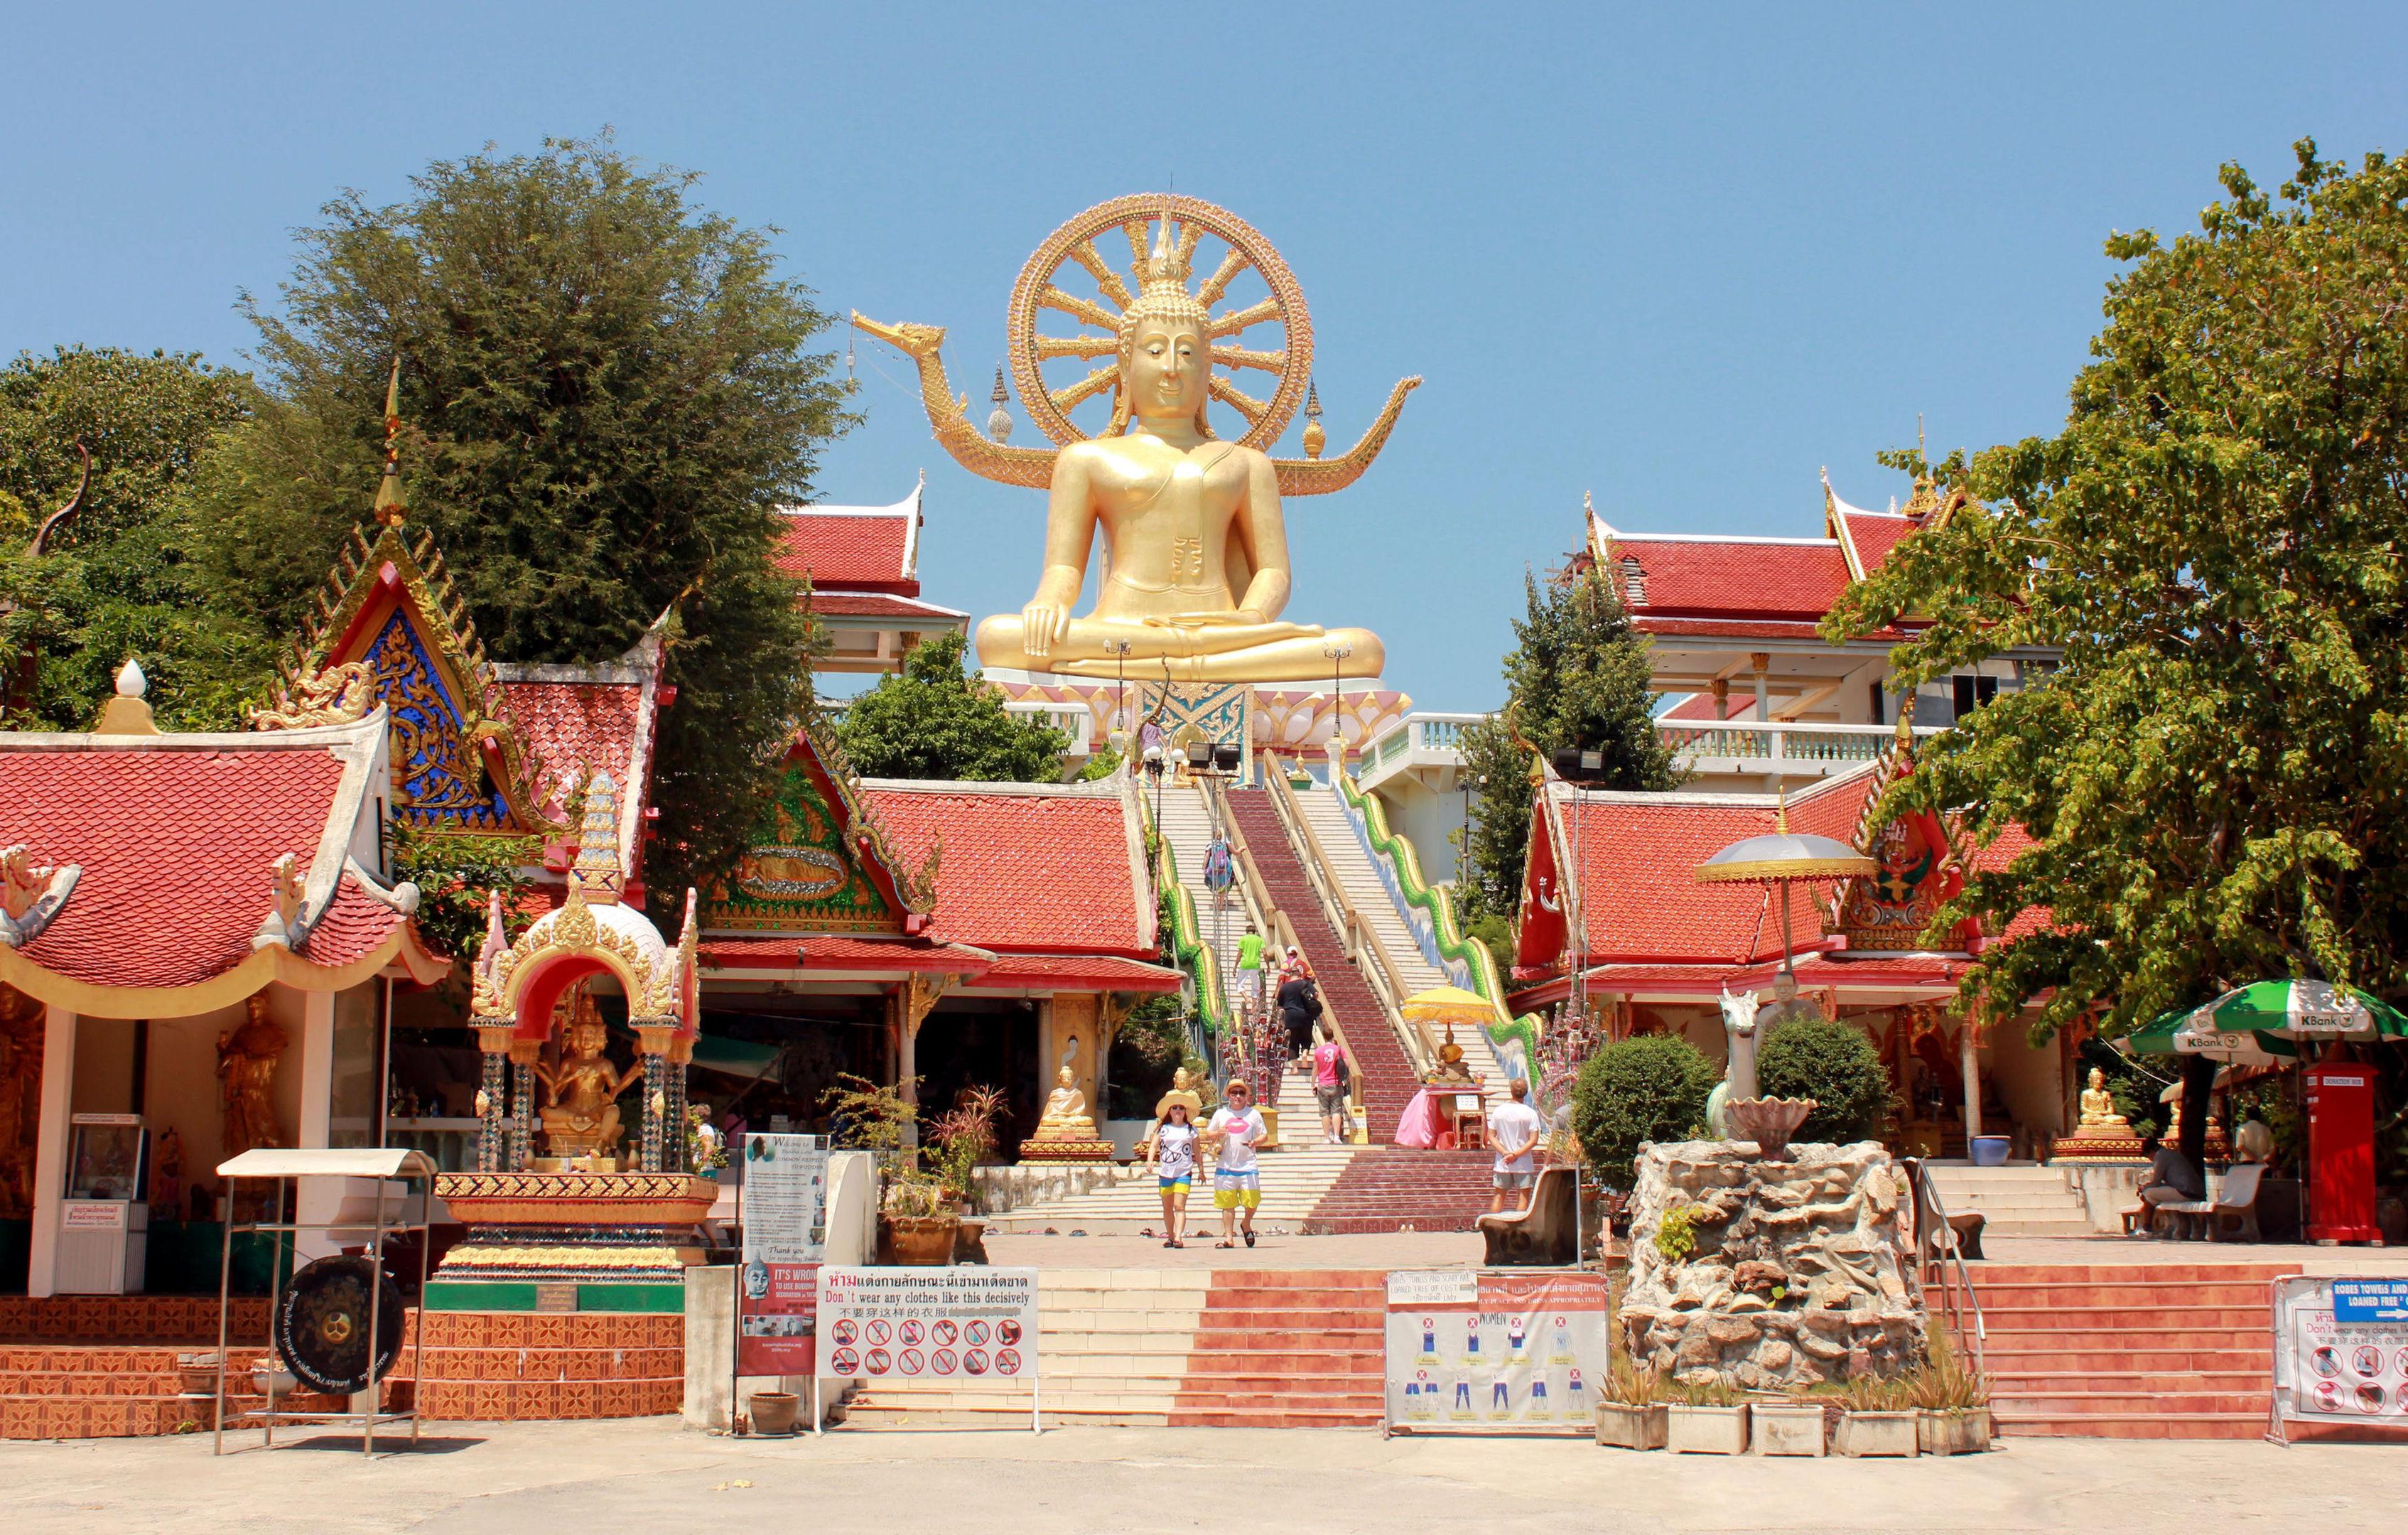 Golden Buddha statue in Koh Samui.